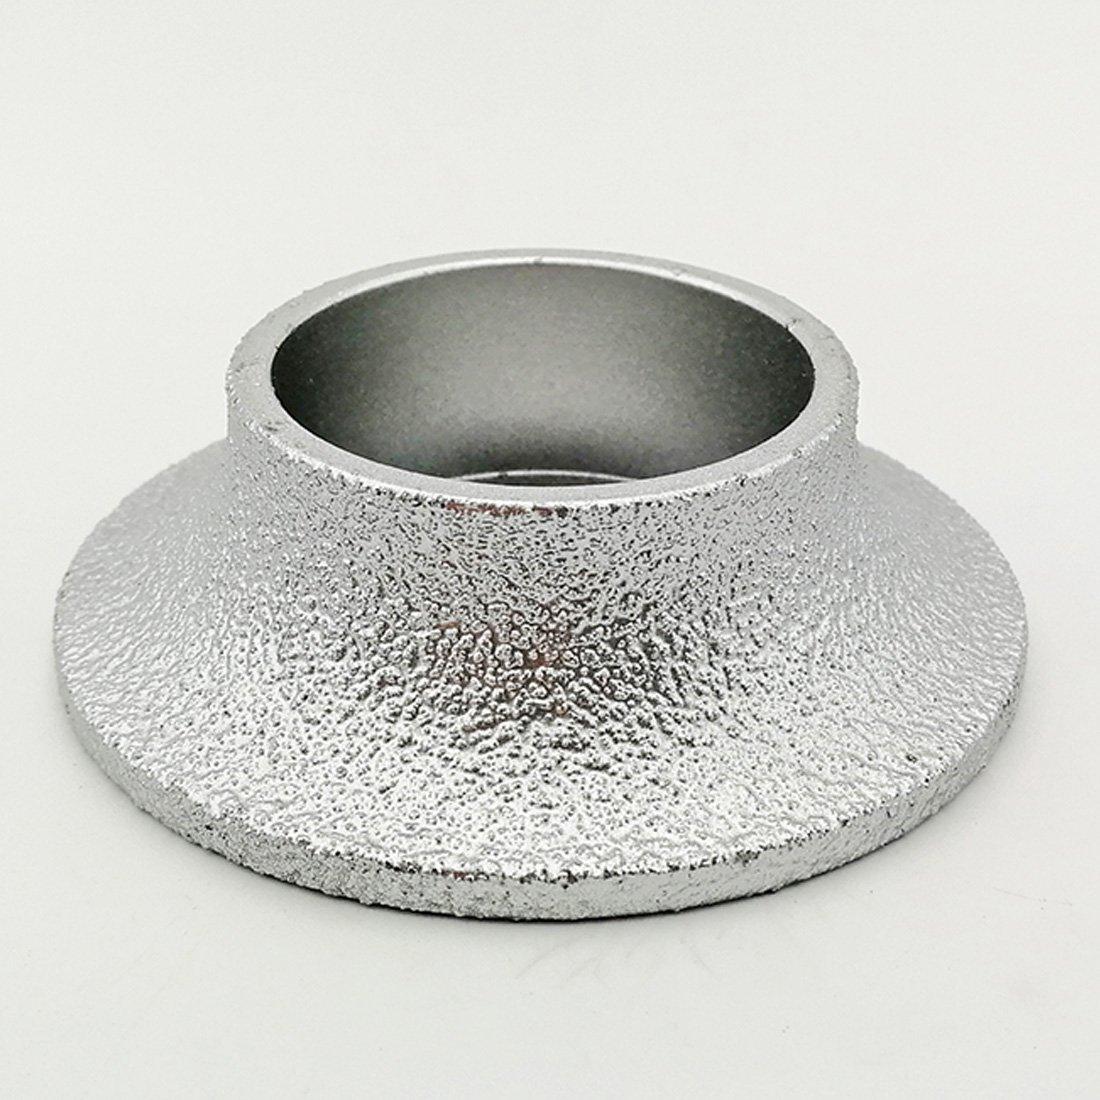 no!no! DIATOOL 3 Inch/75MM Vacuum Brazed Diamond Grinding Wheel Demi-bullnose Edge Profile for Stone Abrasive grinding disc Vacuum brazed Profile Hand diamond Wheel Grit 60 (Diamond Height 20mm)